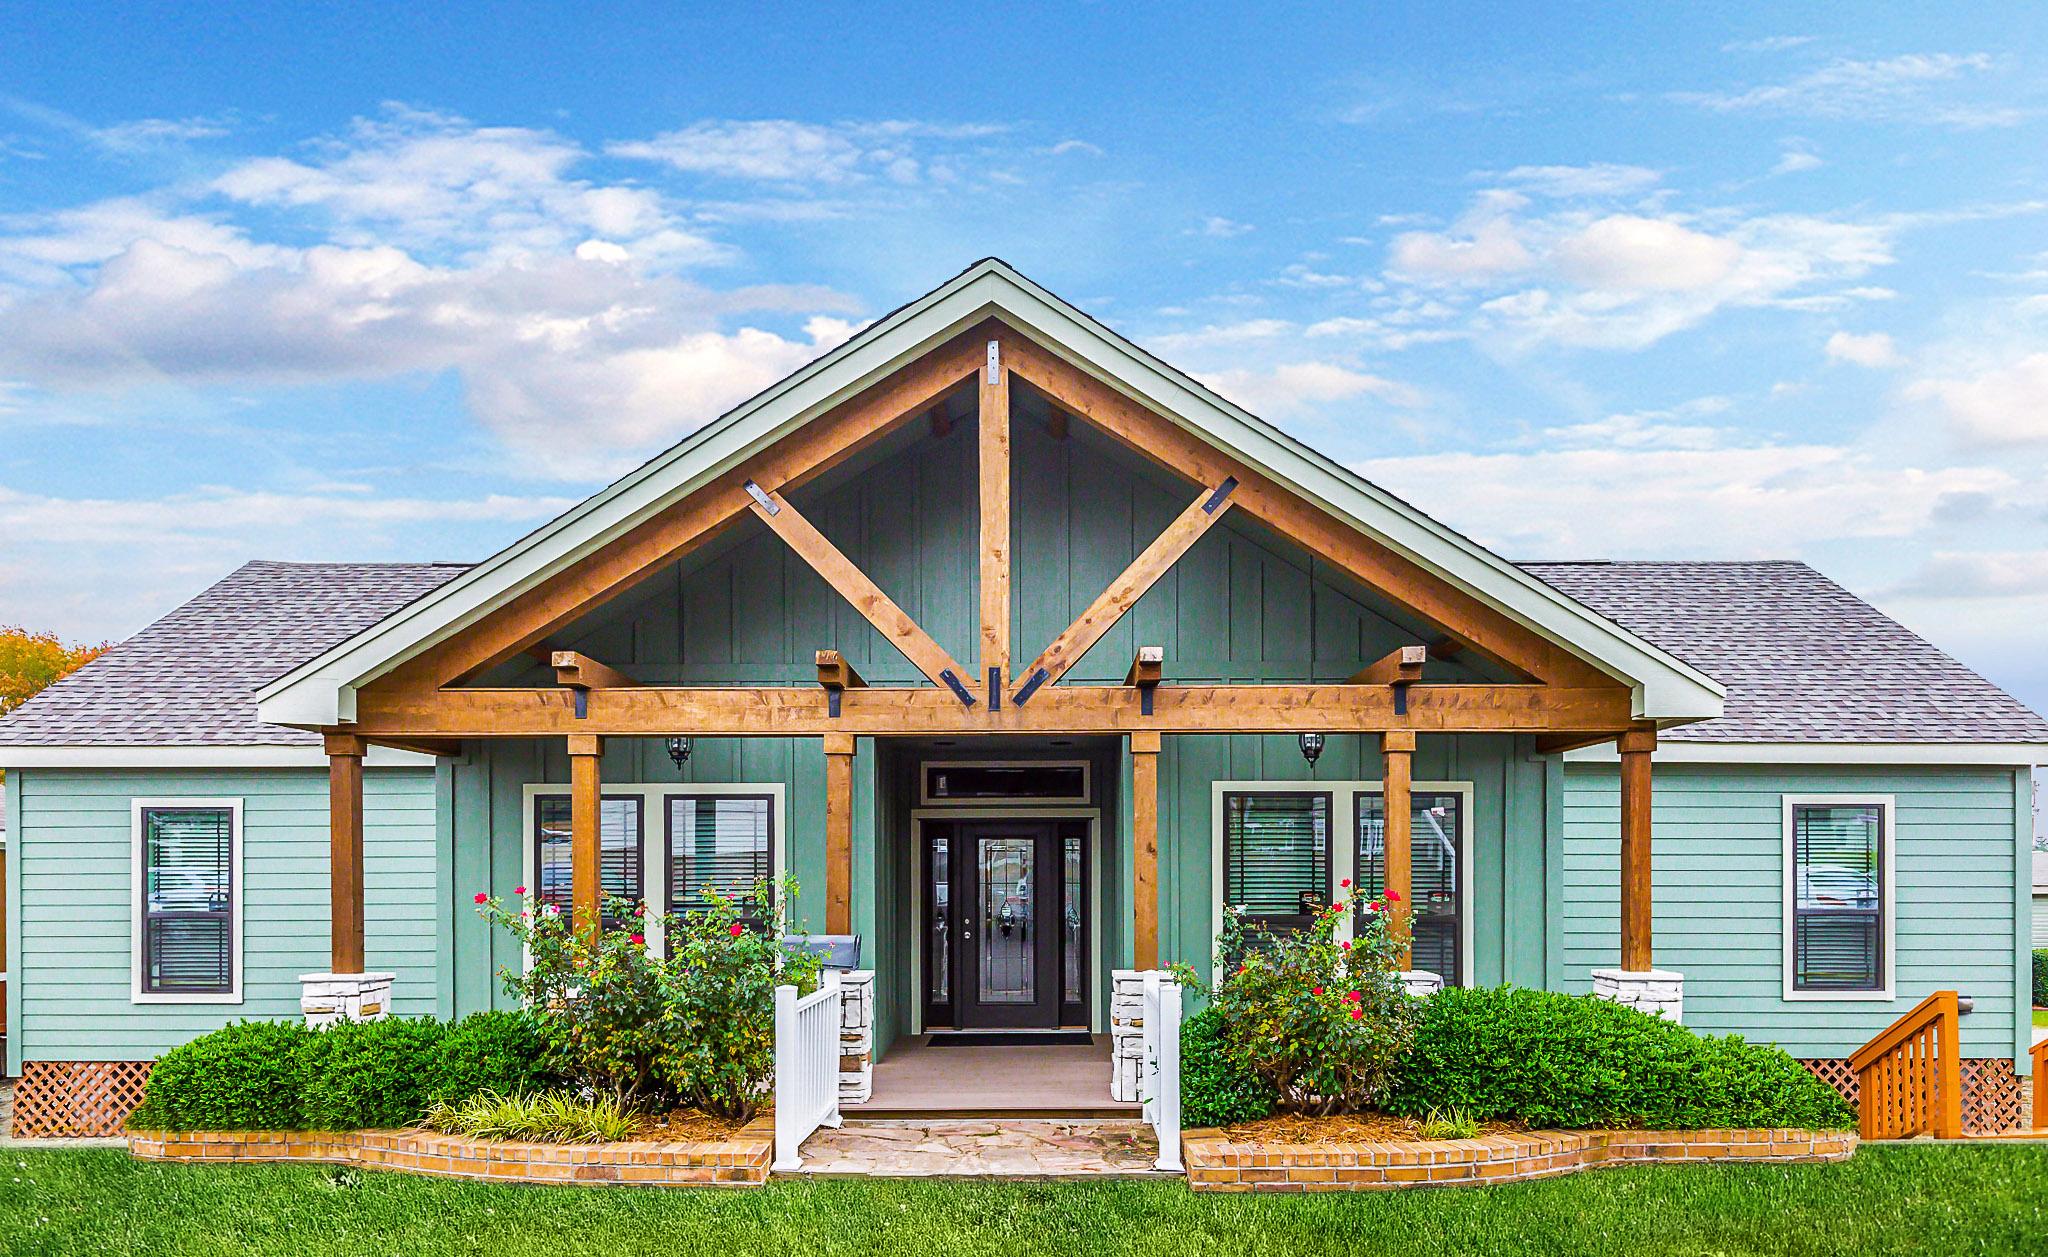 Emejing Modular Home Designs Images Amazing House